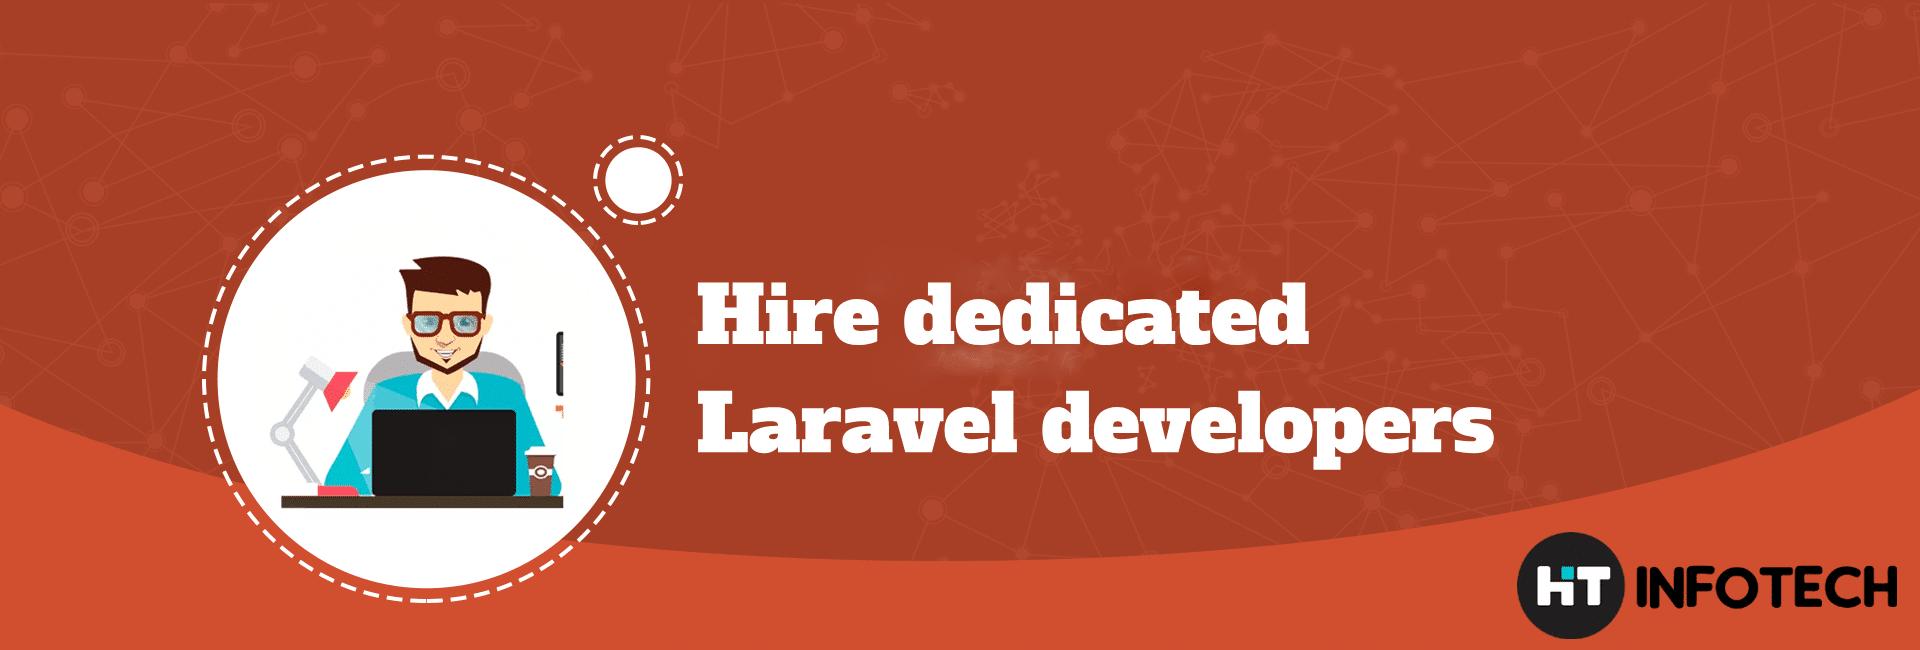 Hire dedicated laravel developer